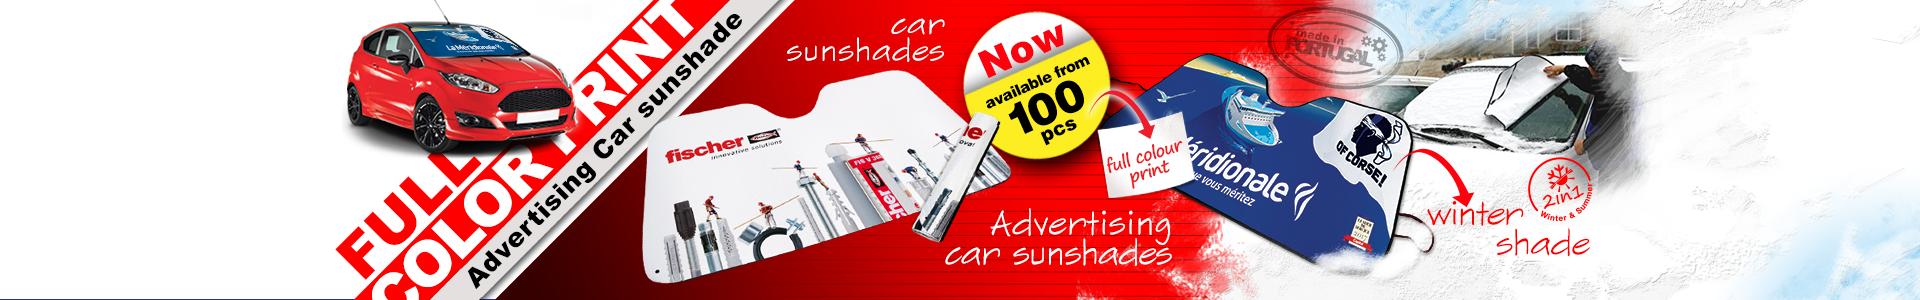 Advertising car sunshade digital printing